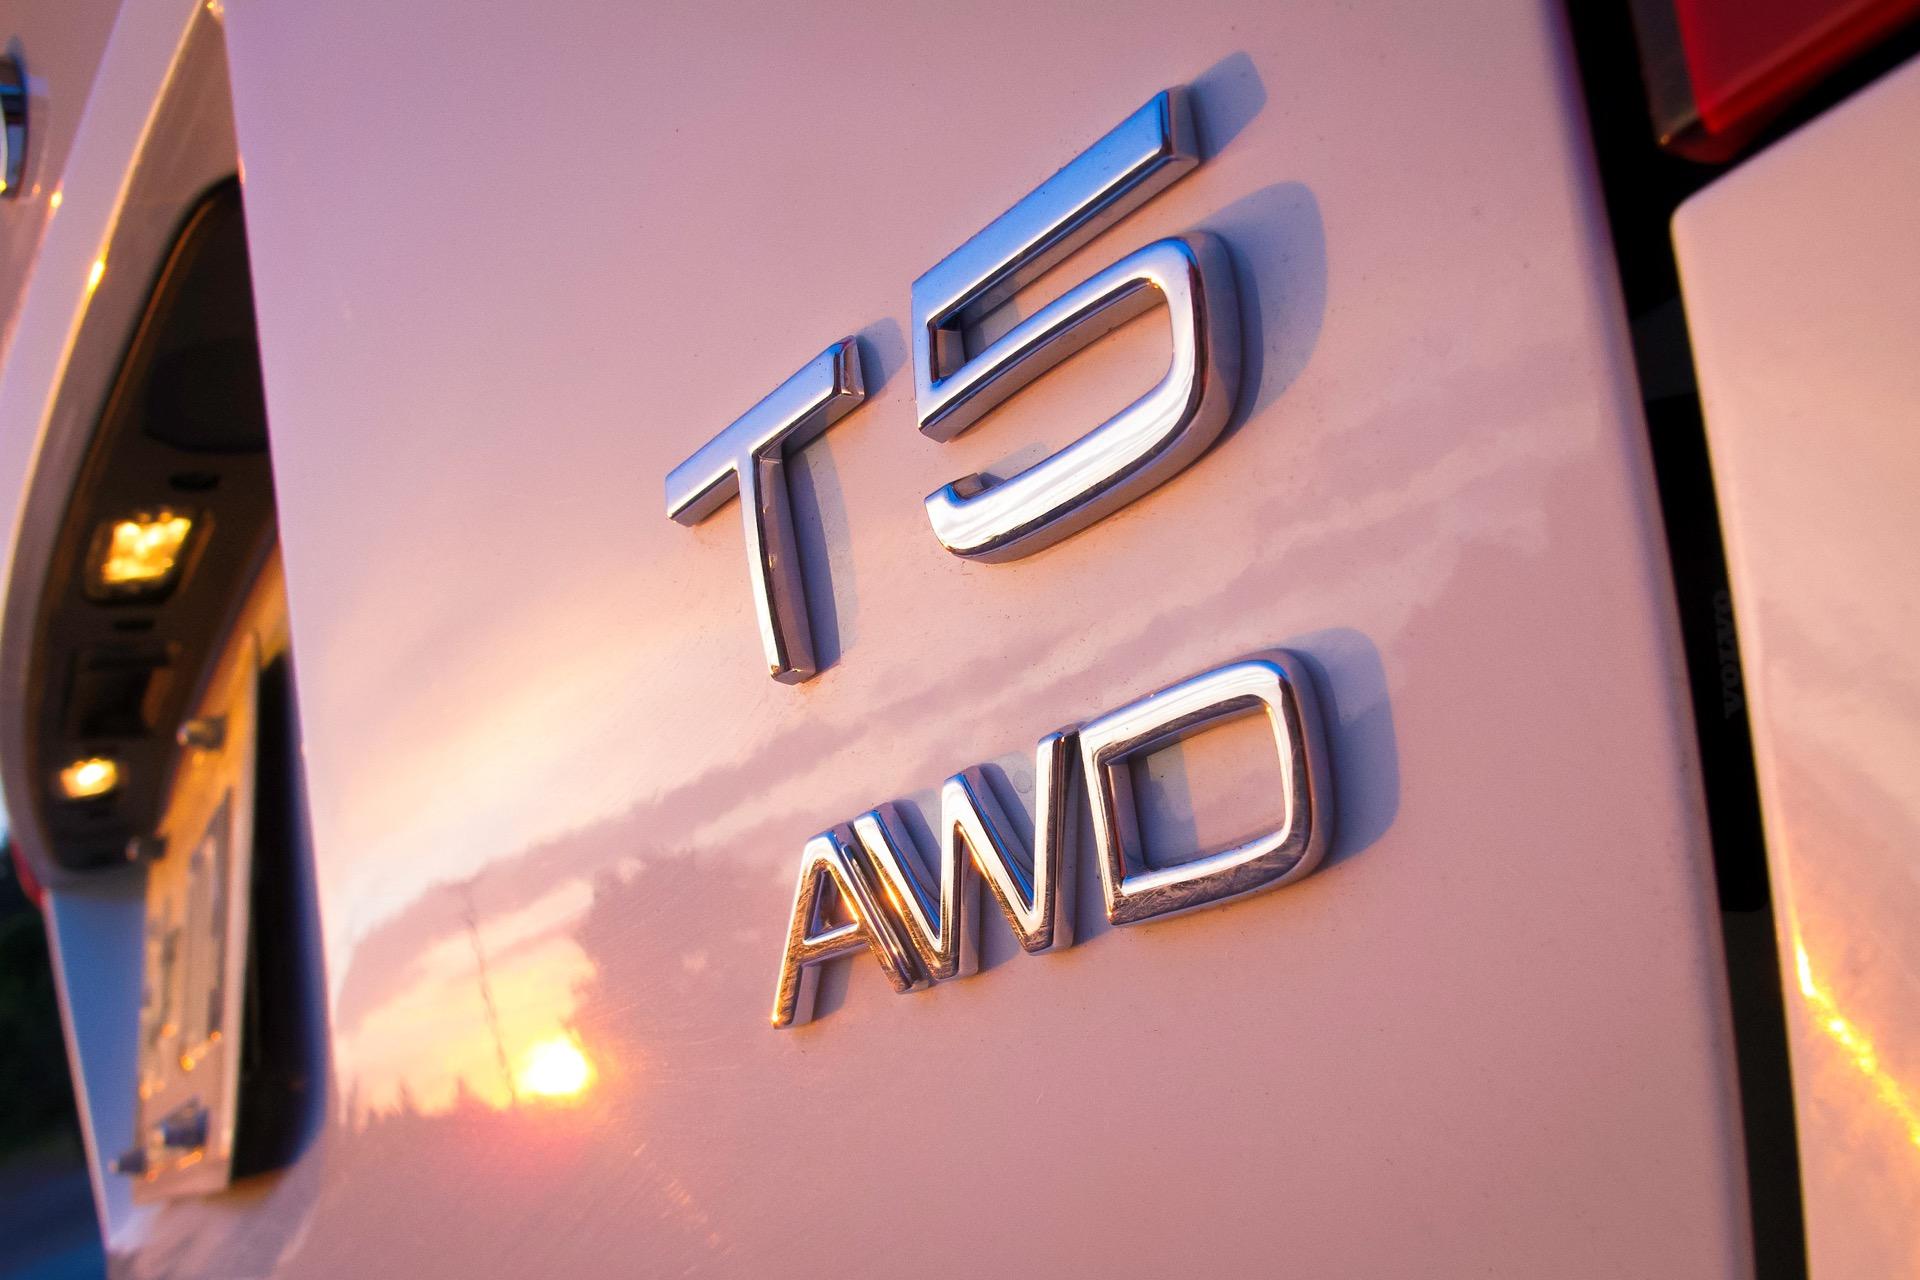 S60 T5 Awd19 -  Volvo